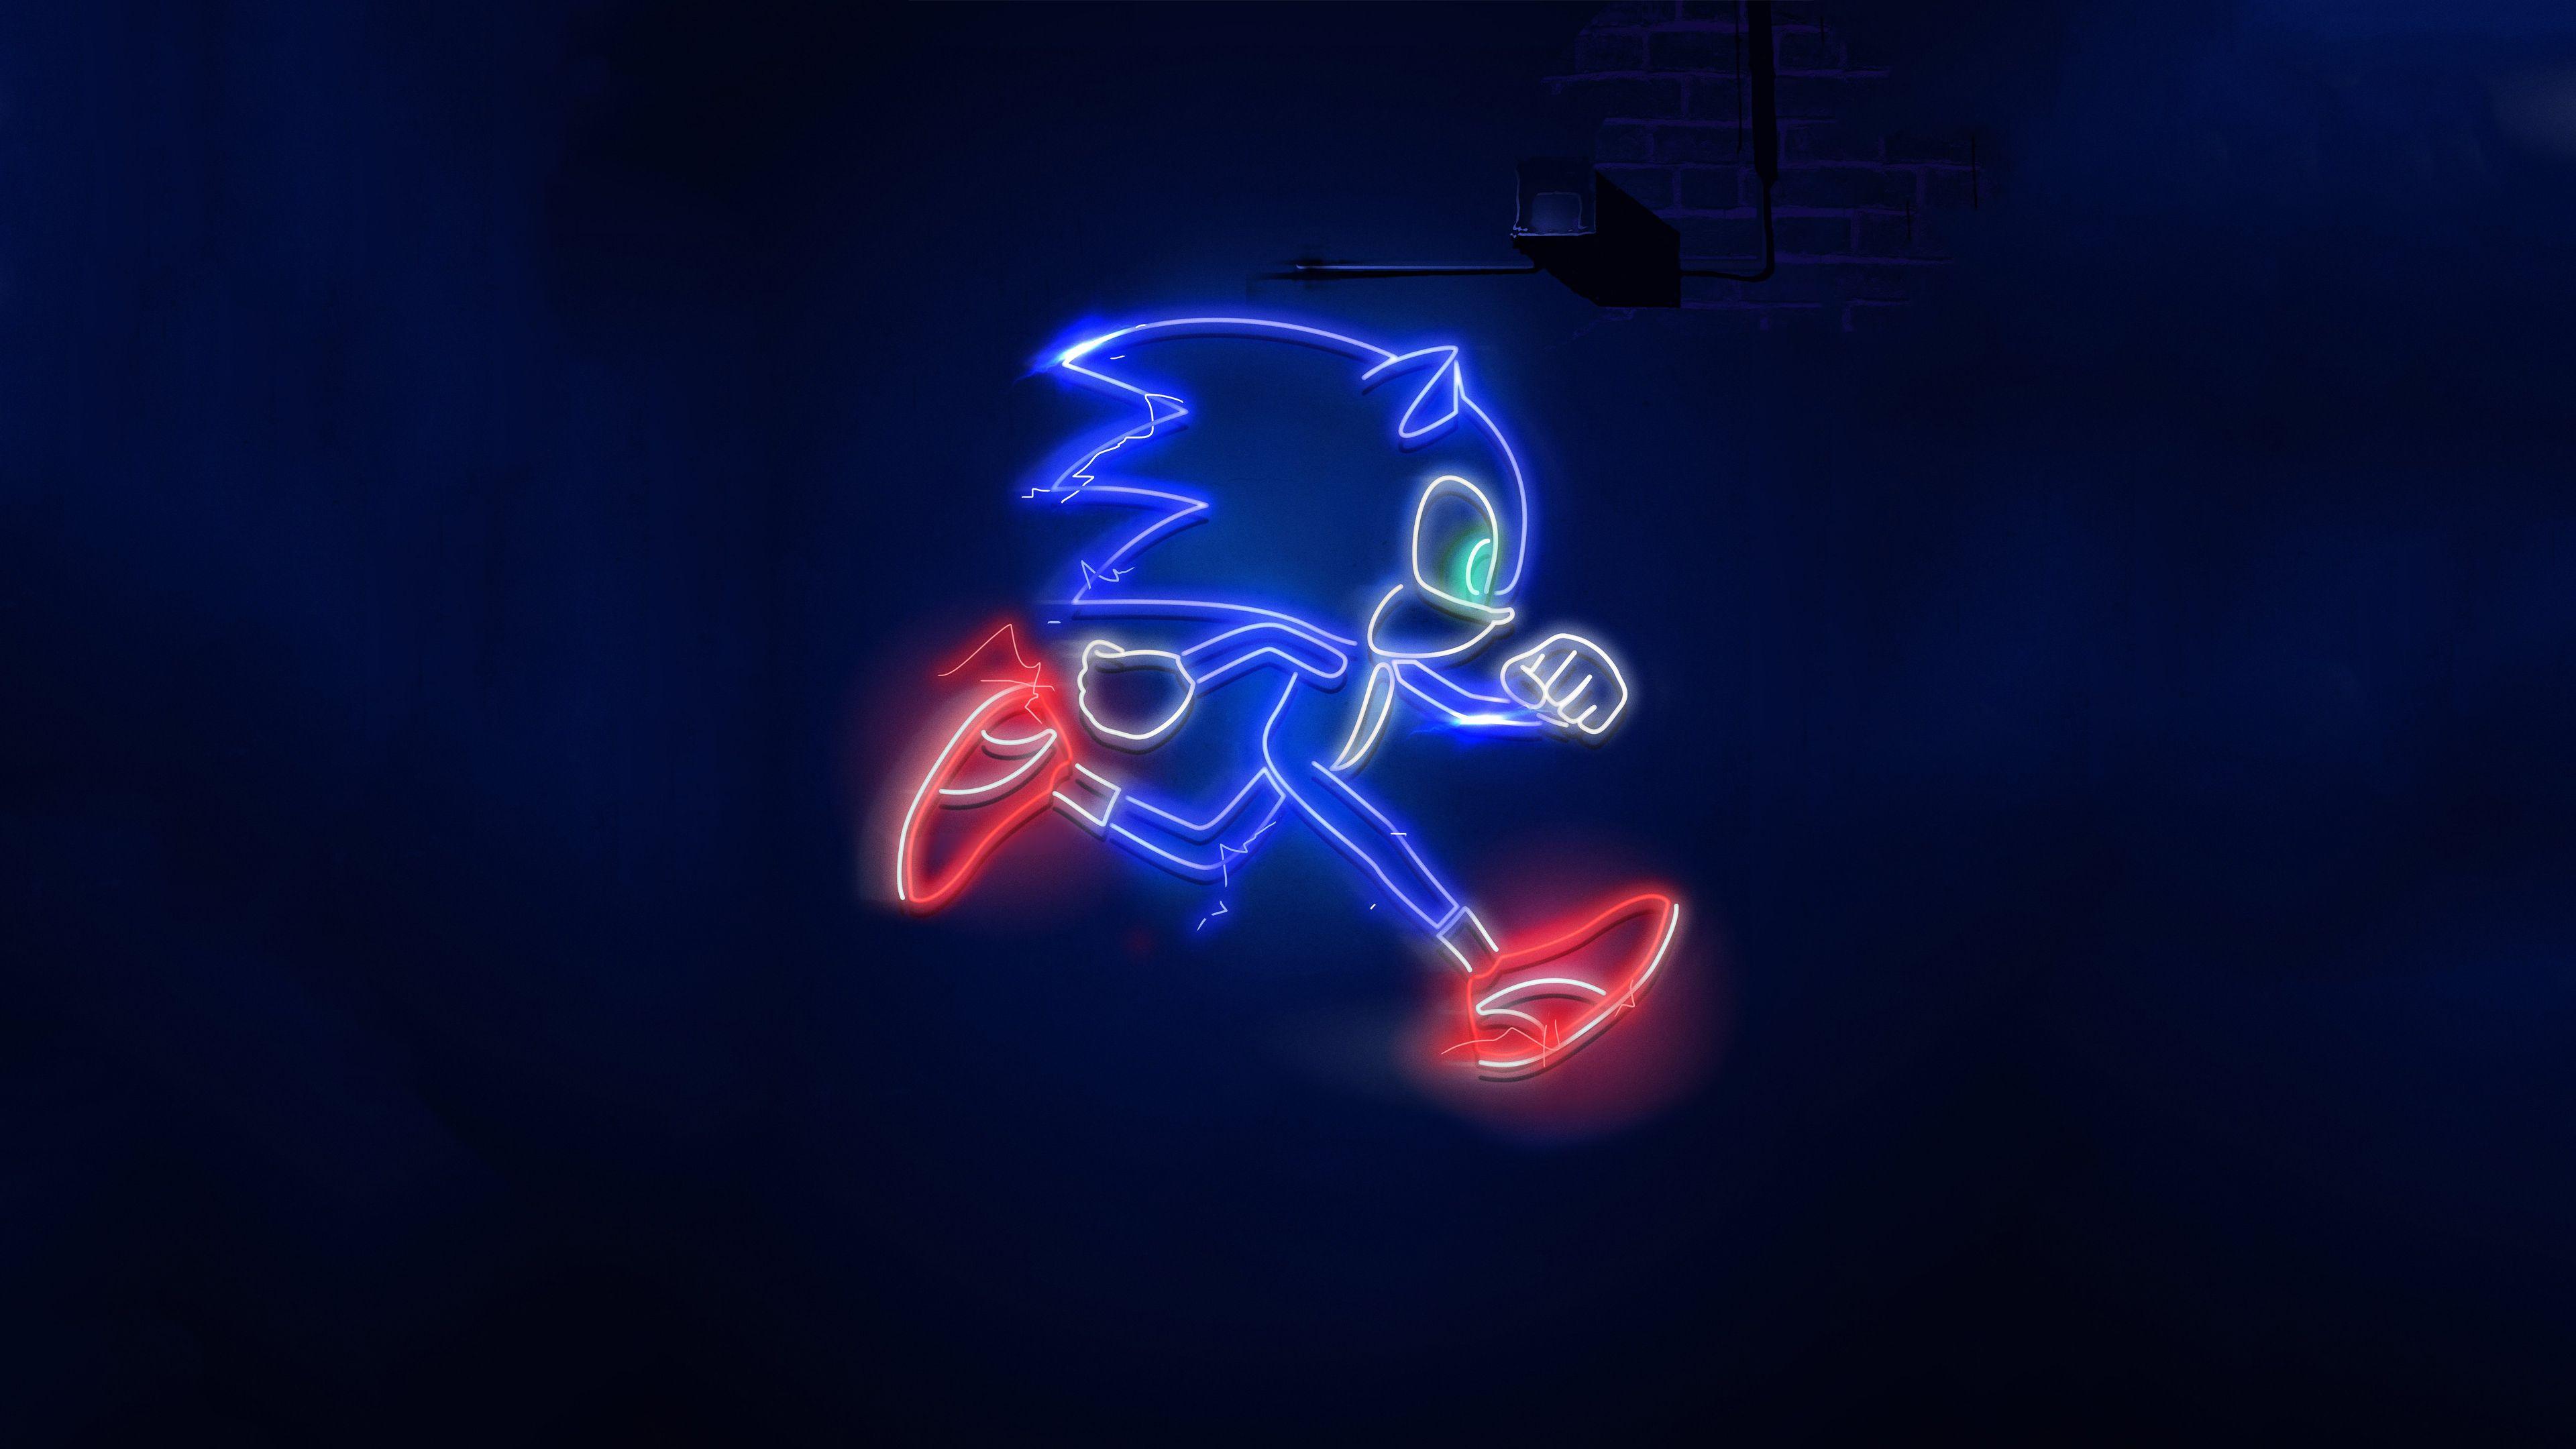 Wallpaper 4k Sonic The Hedgehog Movie 2020 Sonic 4k Wallpapers